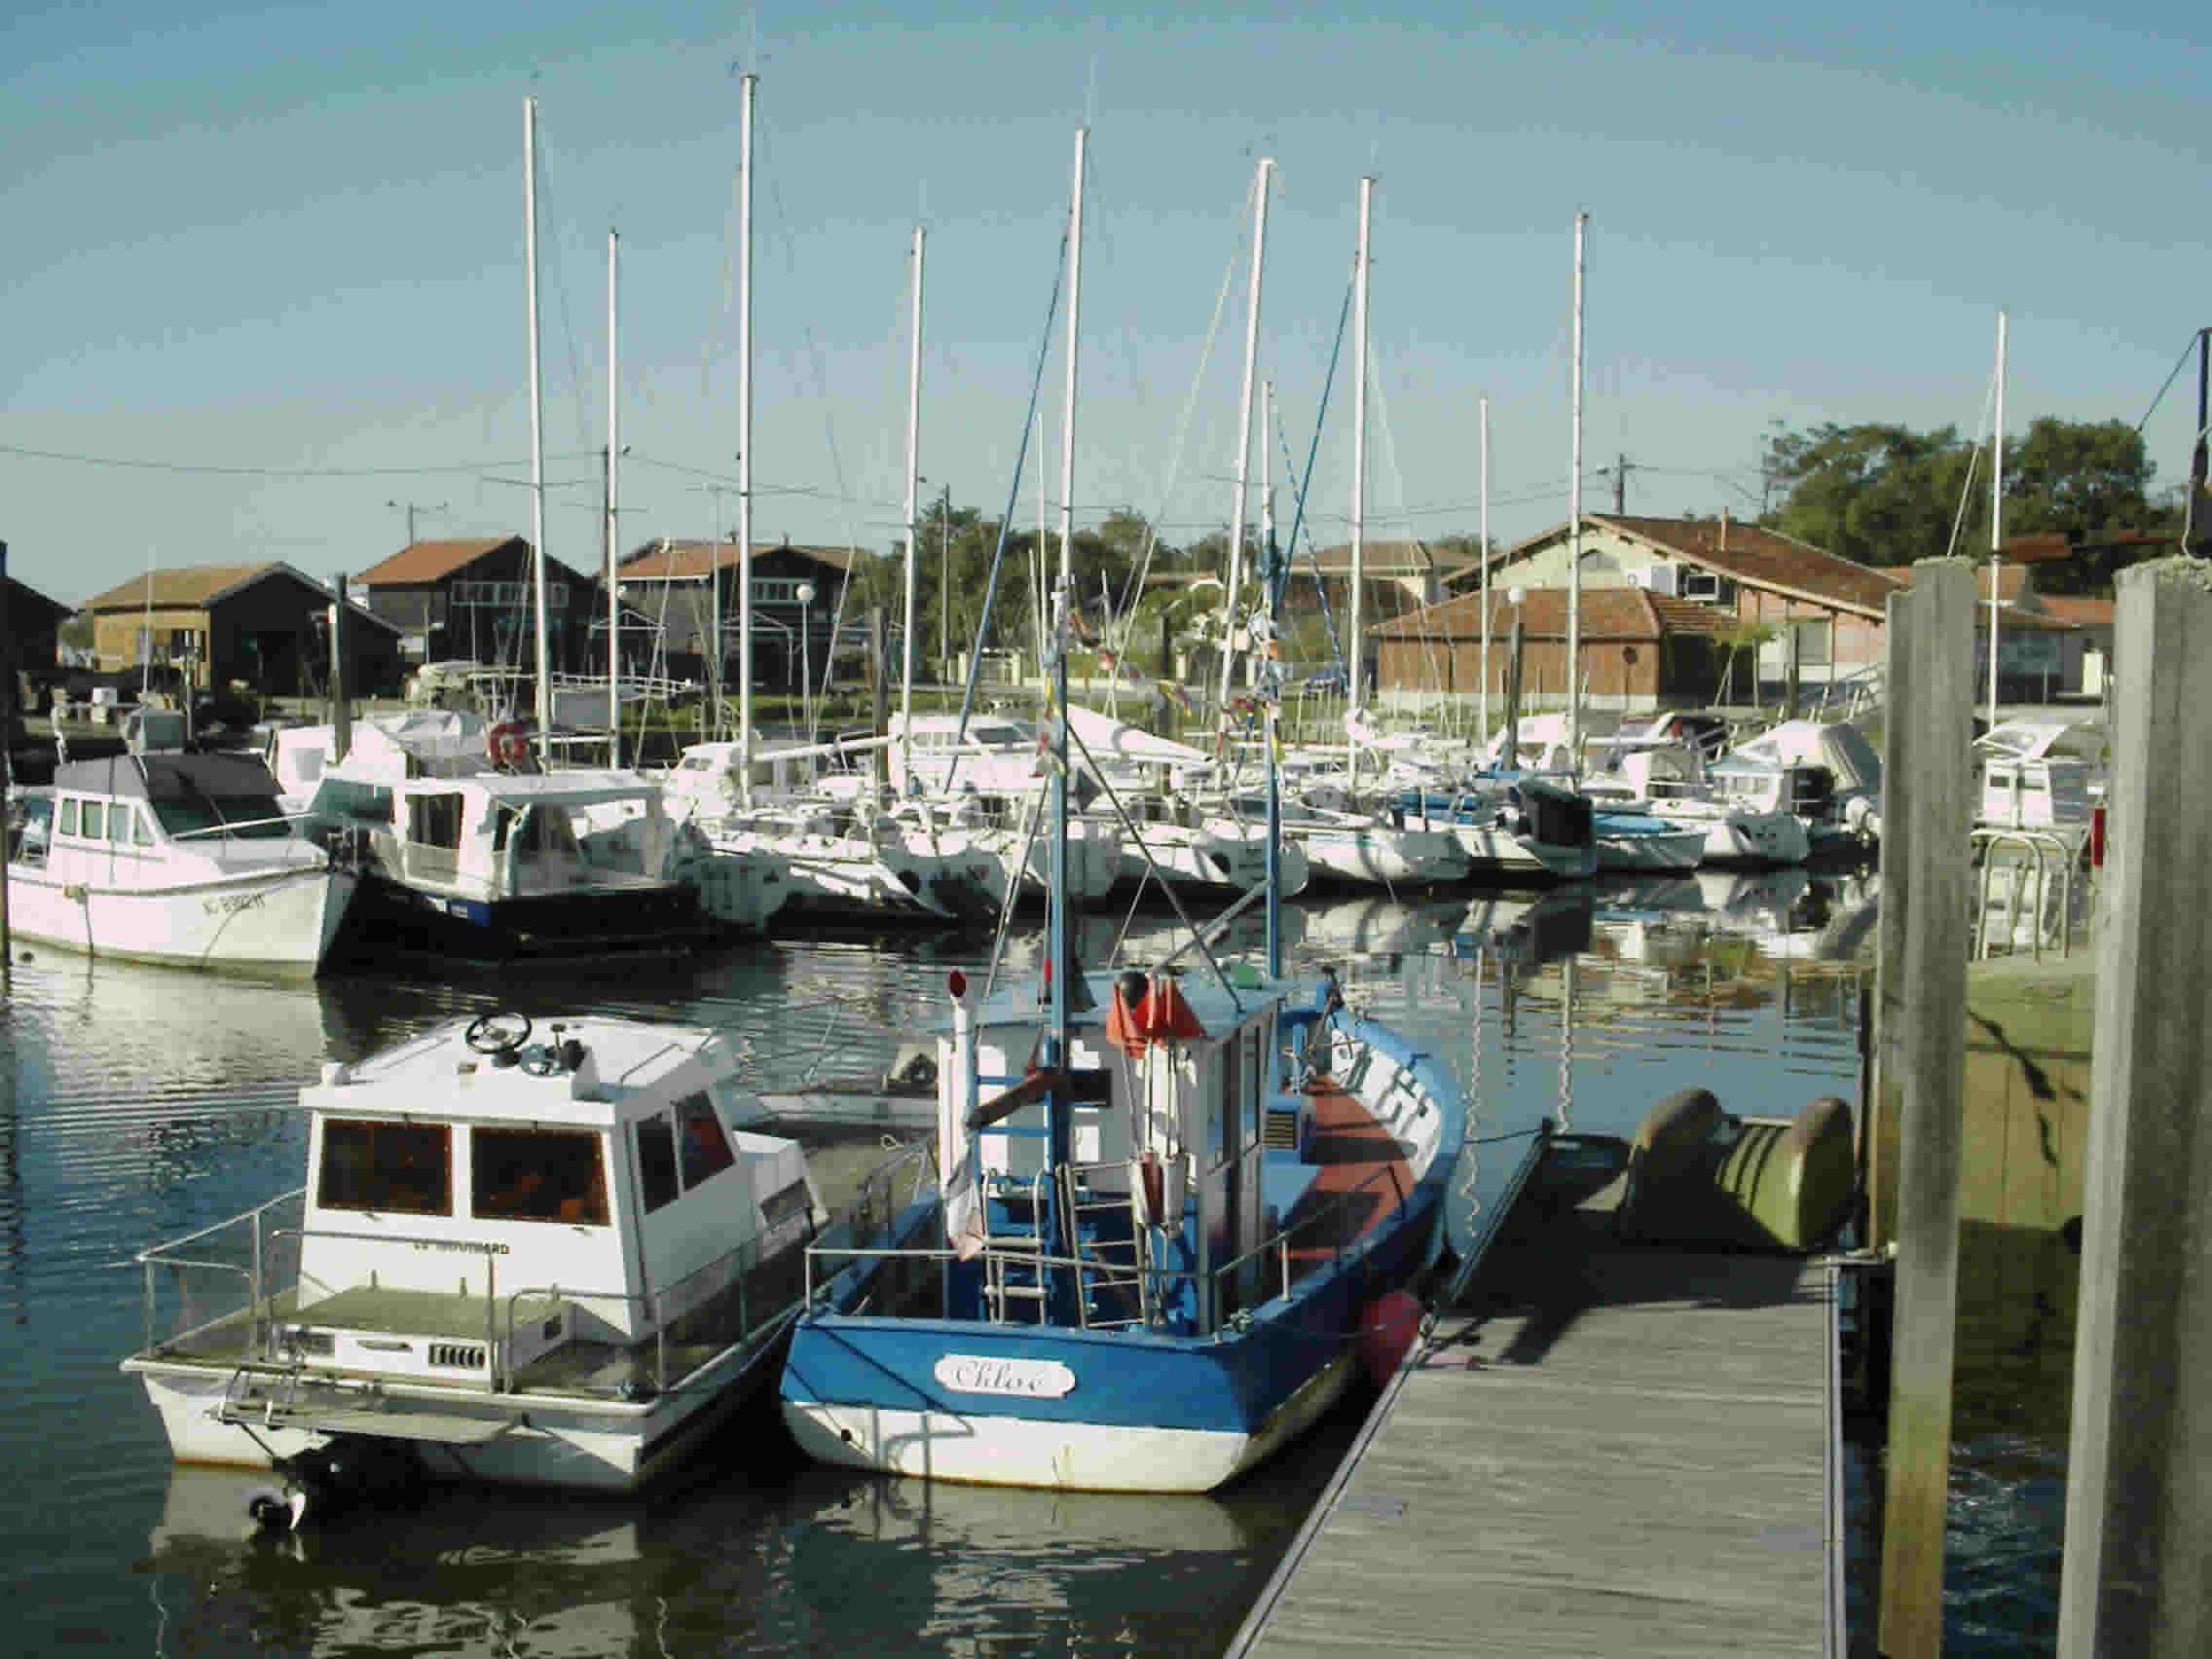 Cassy - Port Lanton